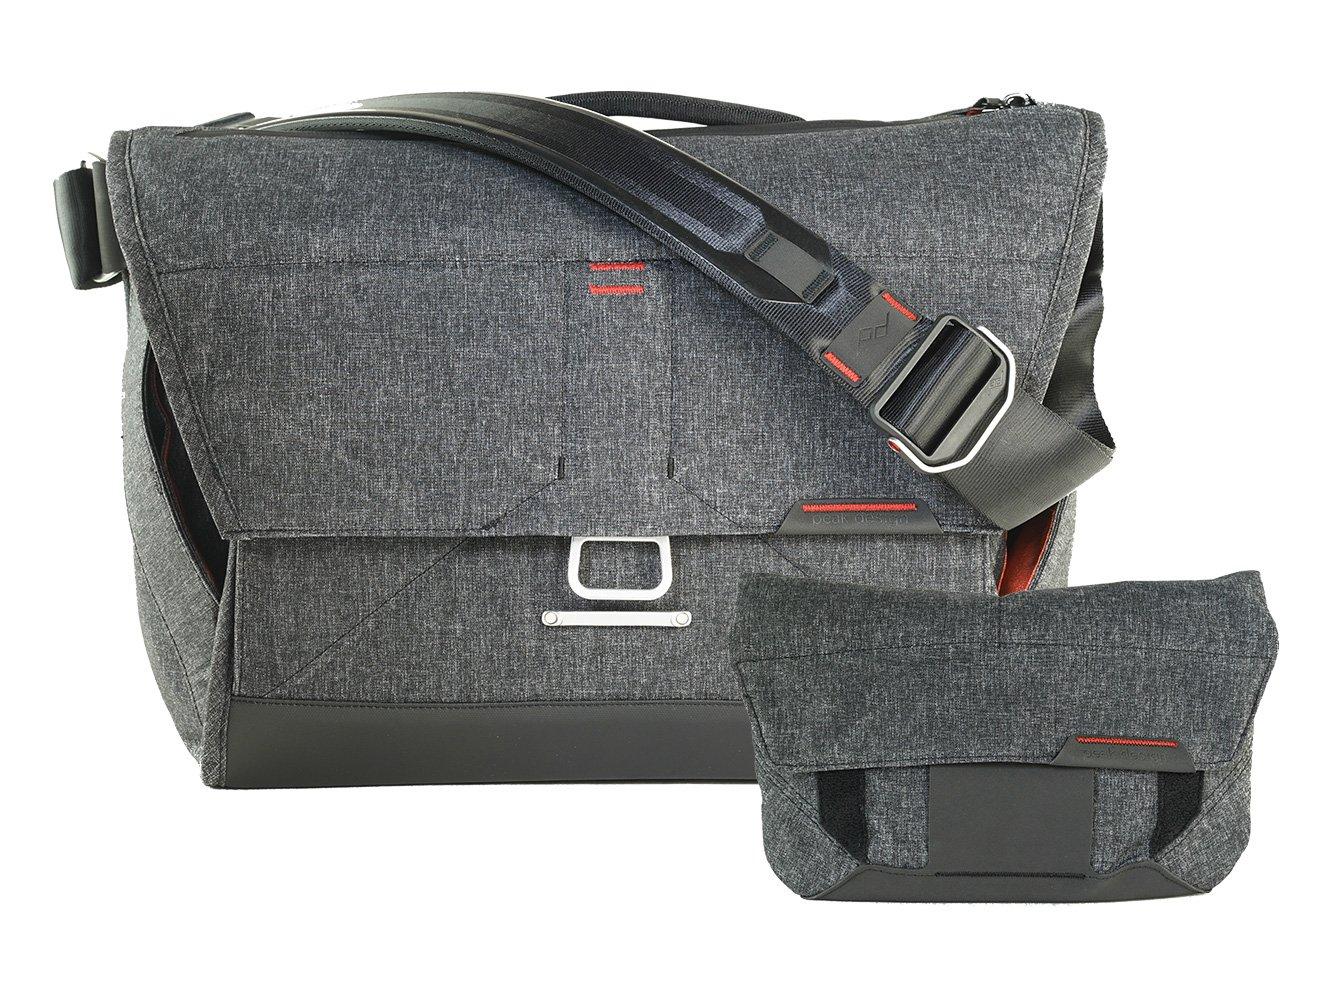 Peak Design 15'' Messenger Bag and Field Pouch (Version 1 - Pre-Bundled Combo - Charcoal)